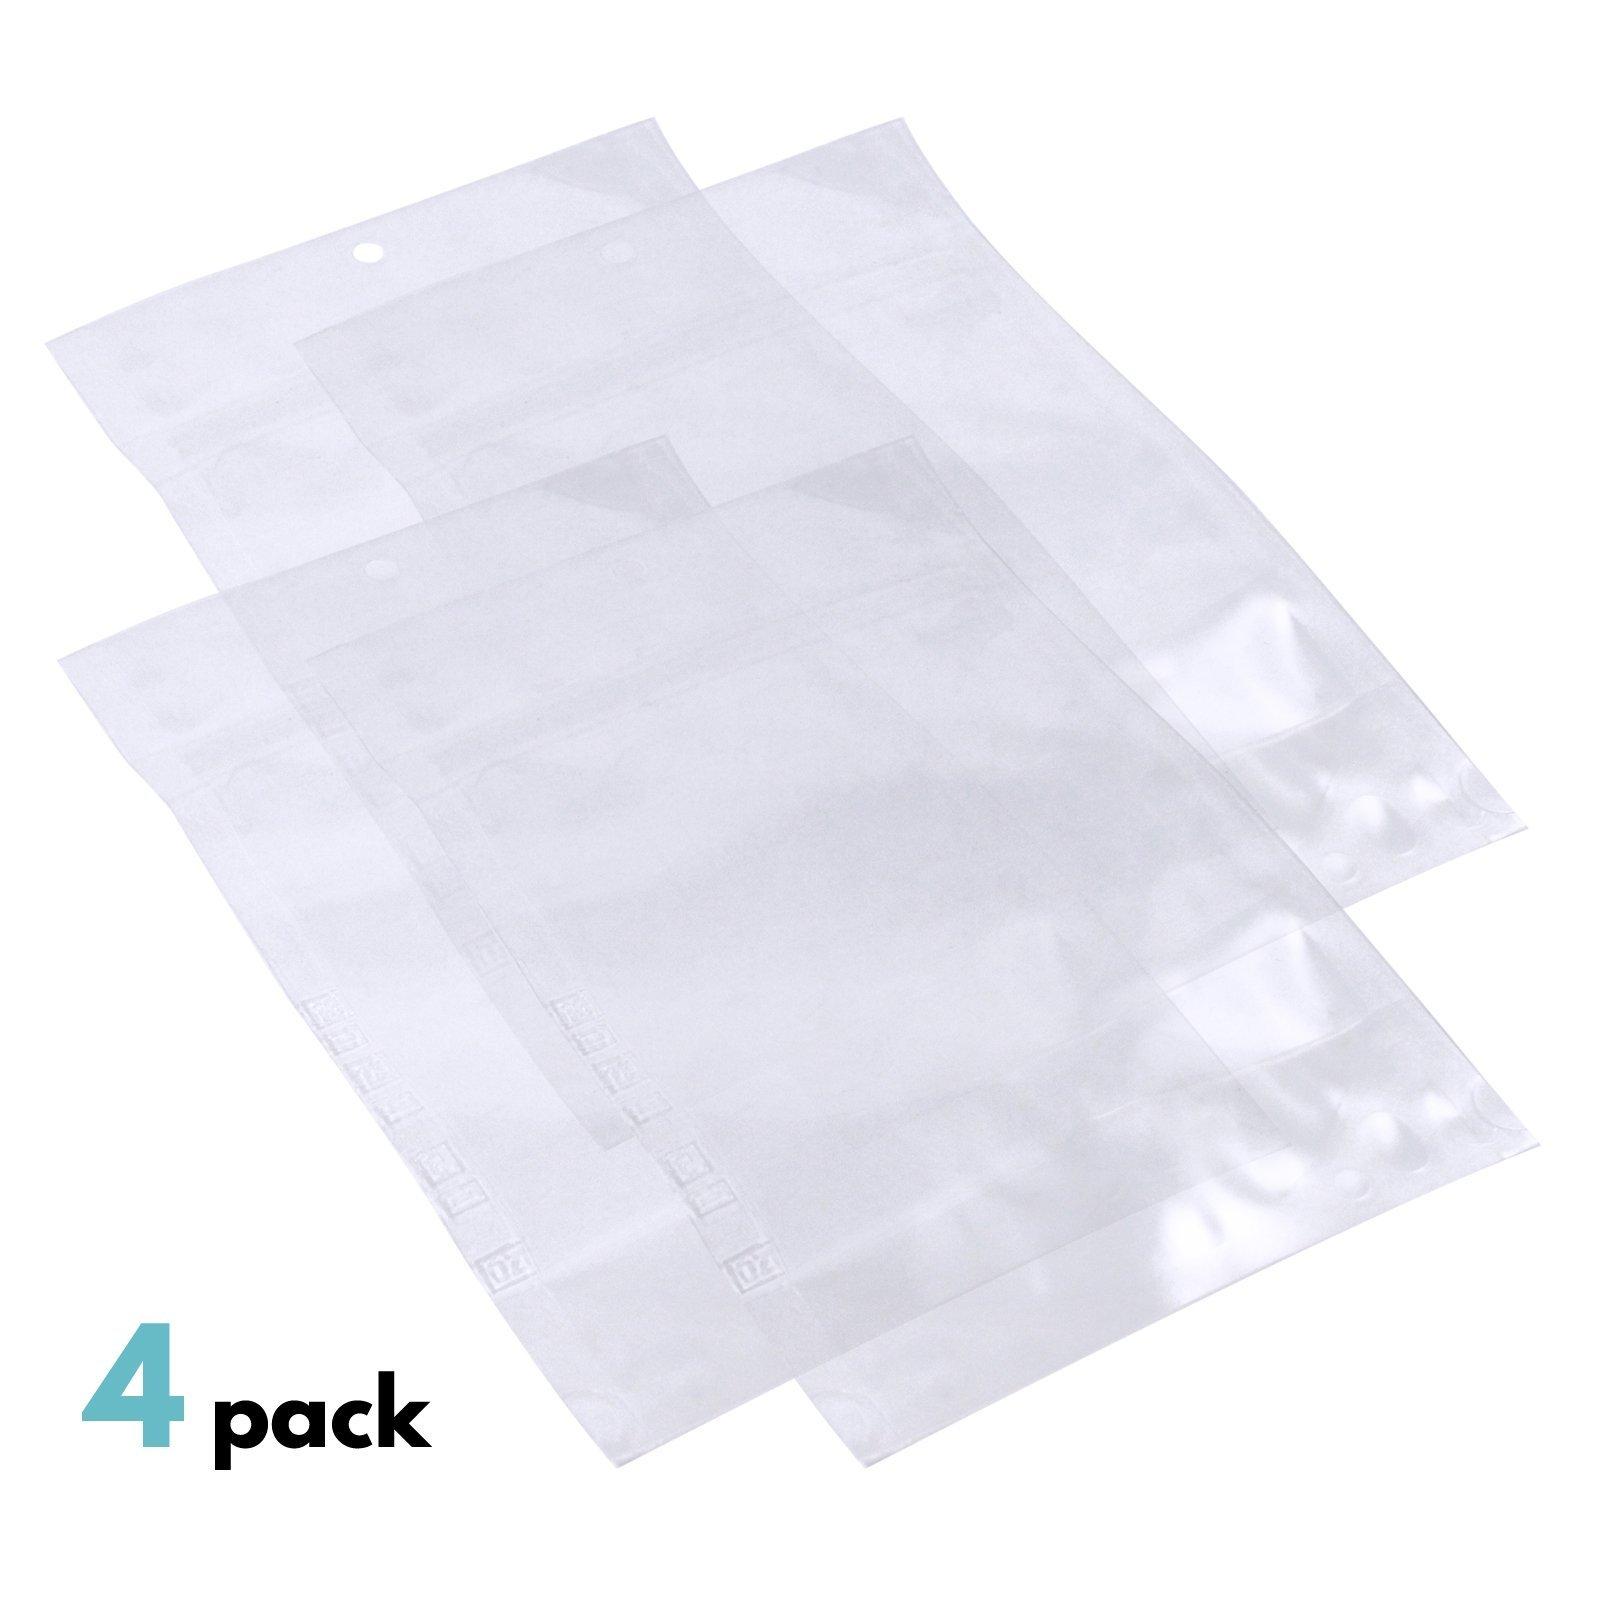 4pk ASR Outdoor Survival Kit Water Bags 1.5 Pints